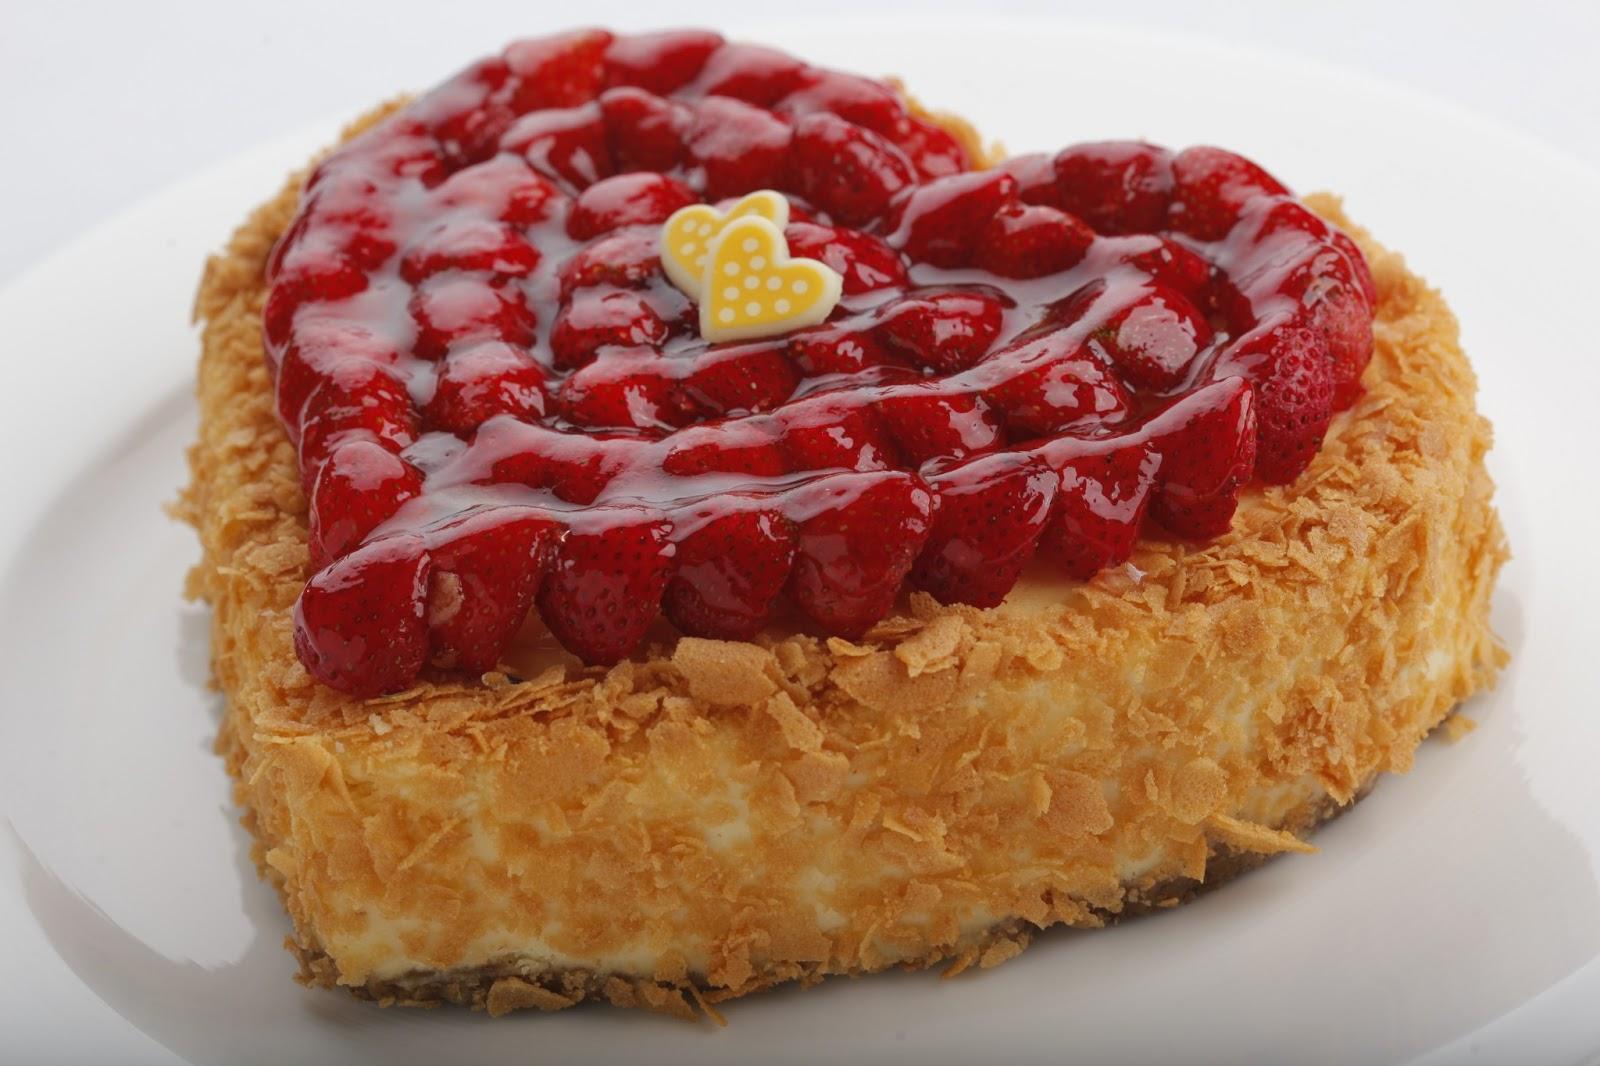 ... almond cheesecake jpg strawberry almond cheesecake strawberry almond